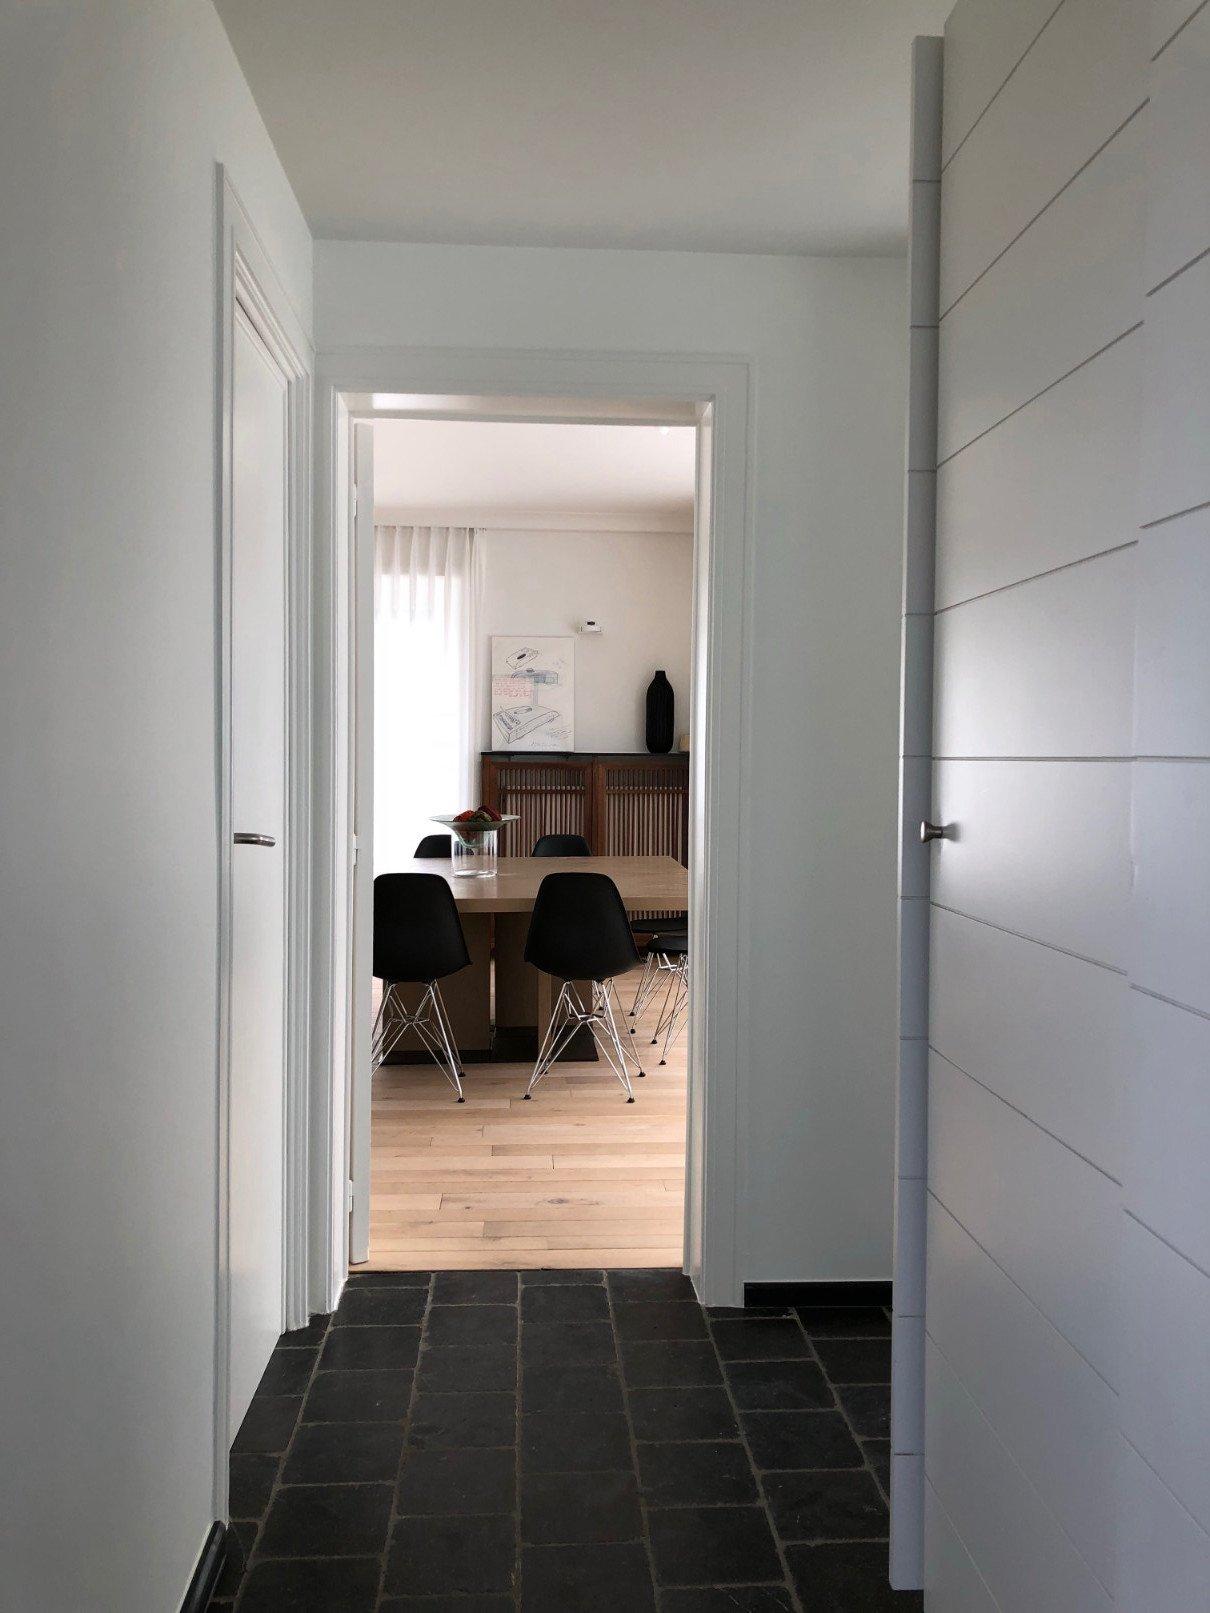 Rietveldprojects-Villa Were Di - Te Koop : Te Huur (per week)28